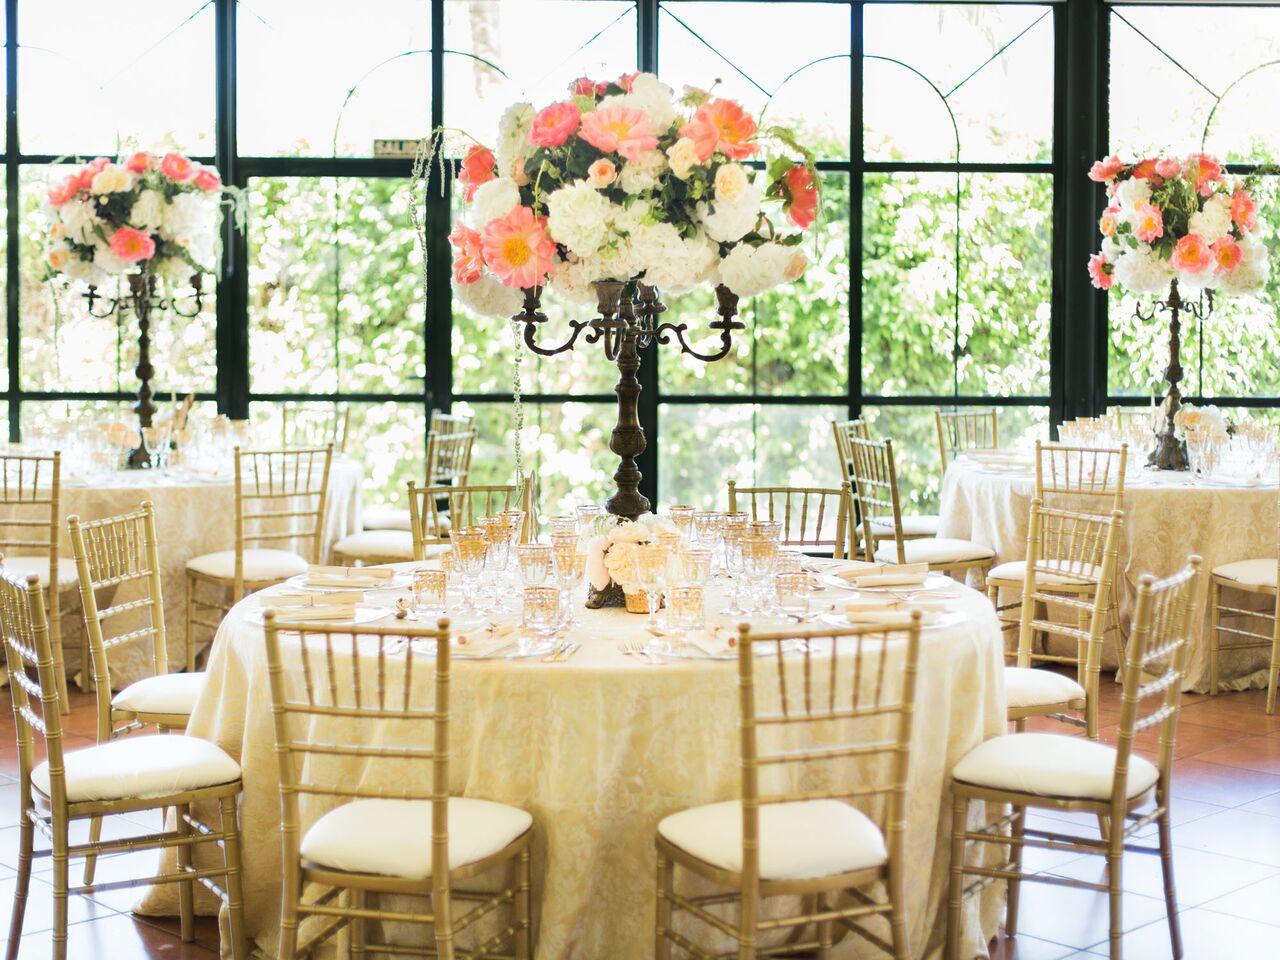 Si-Quiero-Wedding-Planner-By-Sira-Antequera-Paola-Pedro-3